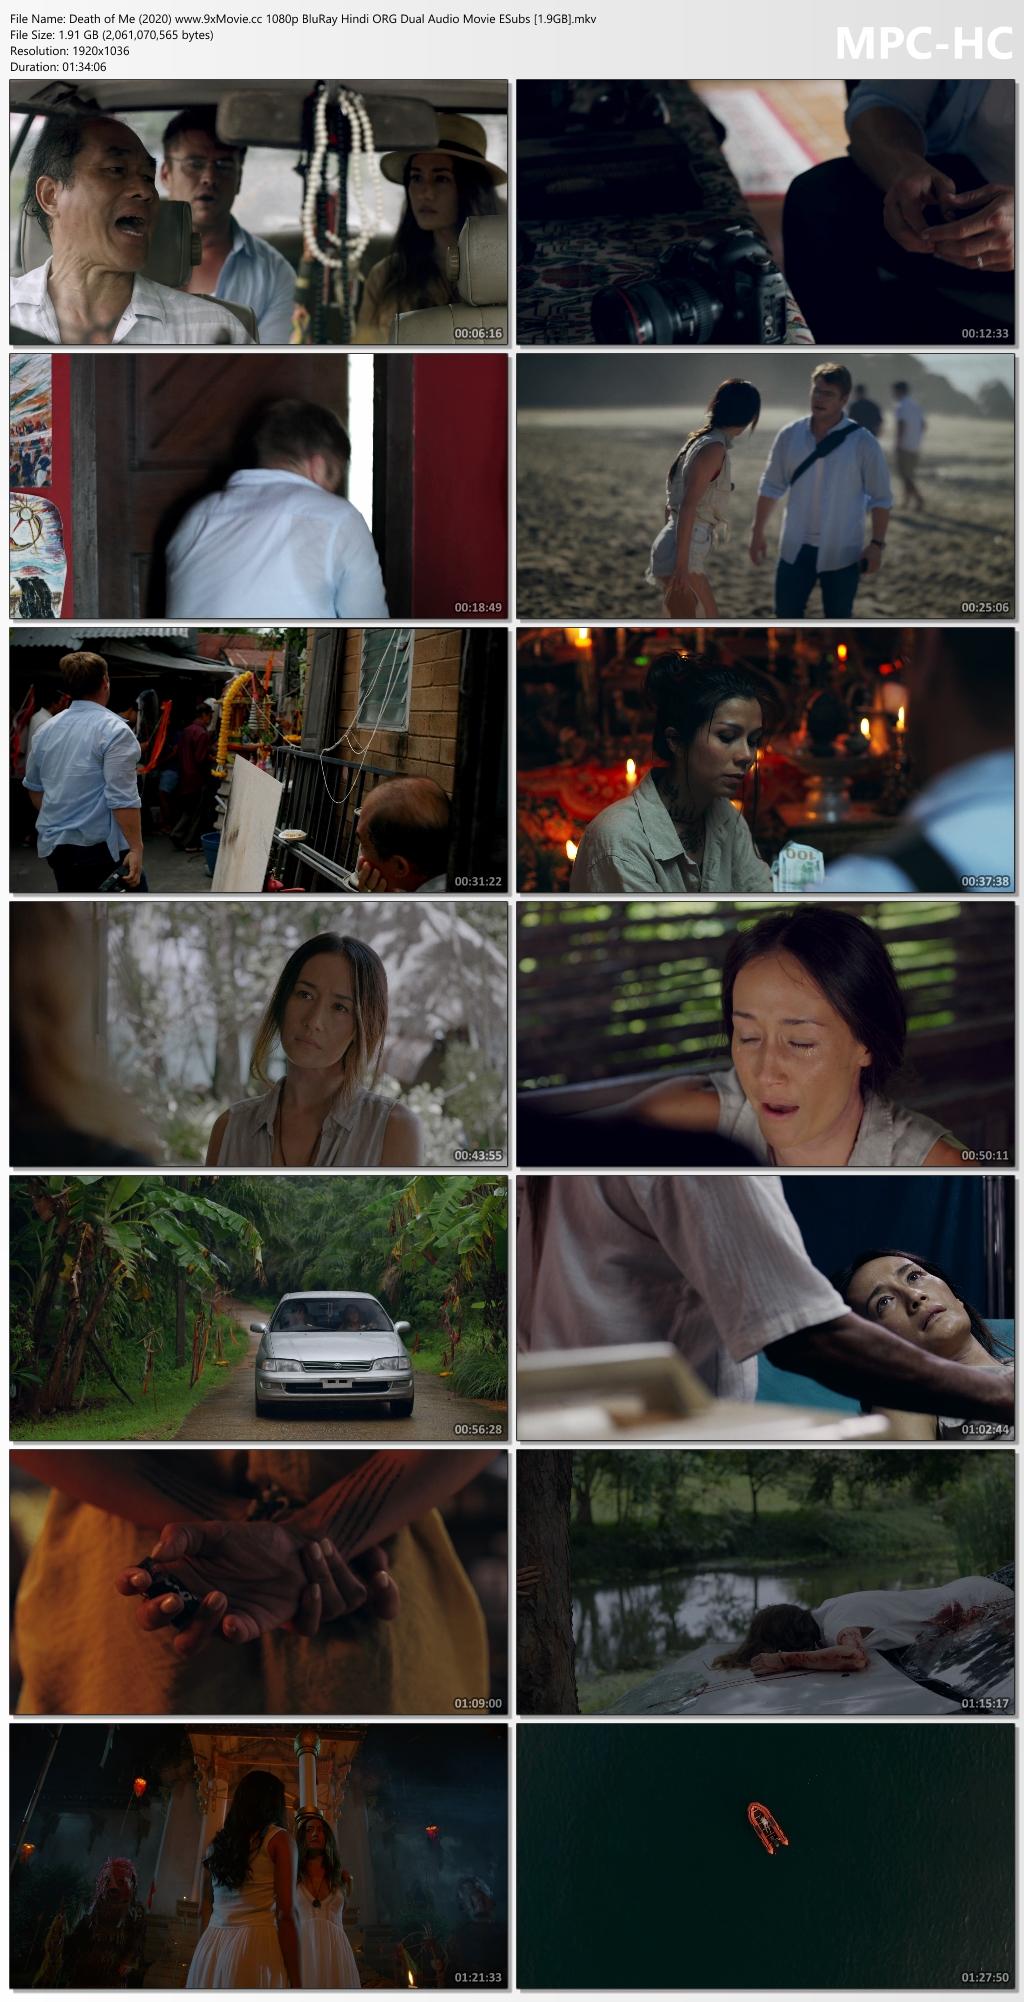 Death-of-Me-2020-www-9x-Movie-cc-1080p-Blu-Ray-Hindi-ORG-Dual-Audio-Movie-ESubs-1-9-GB-mkv